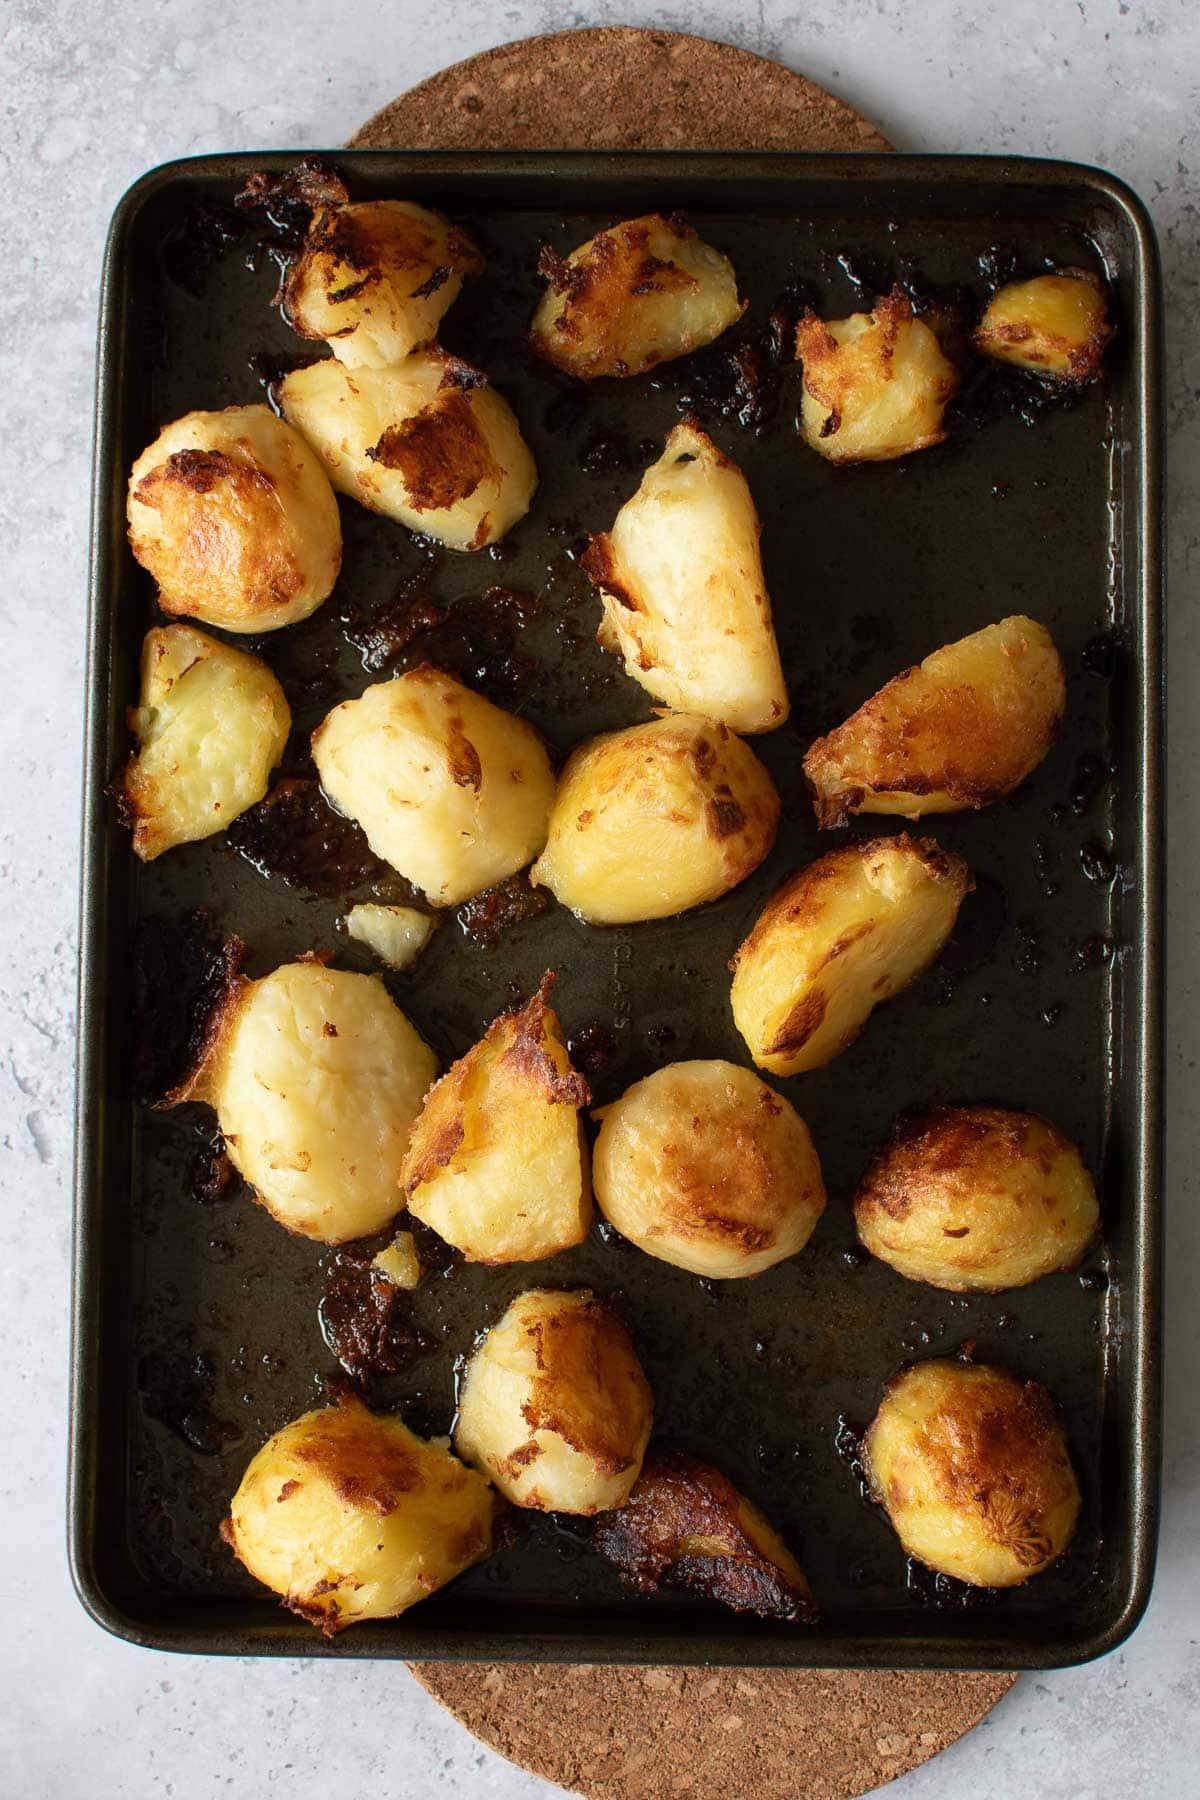 Roast potatoes on a sheet pan.